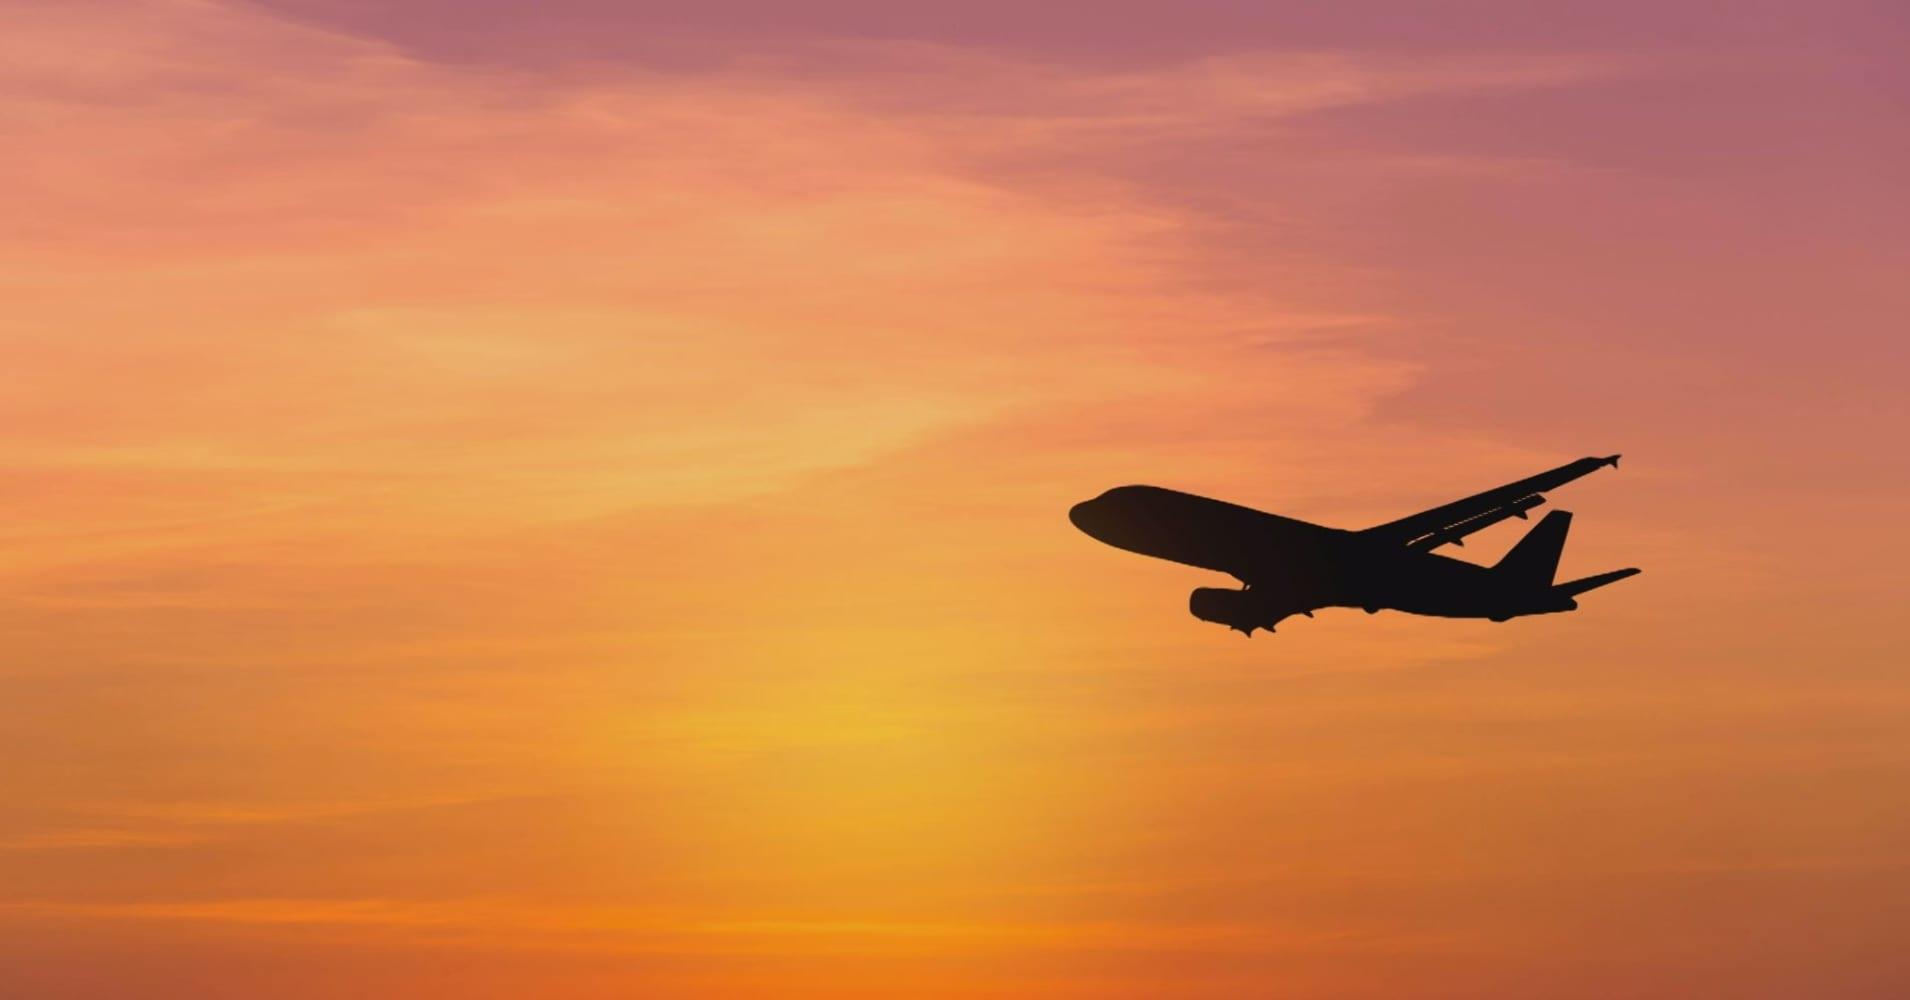 Air traffic controller shortage delays flights at several US